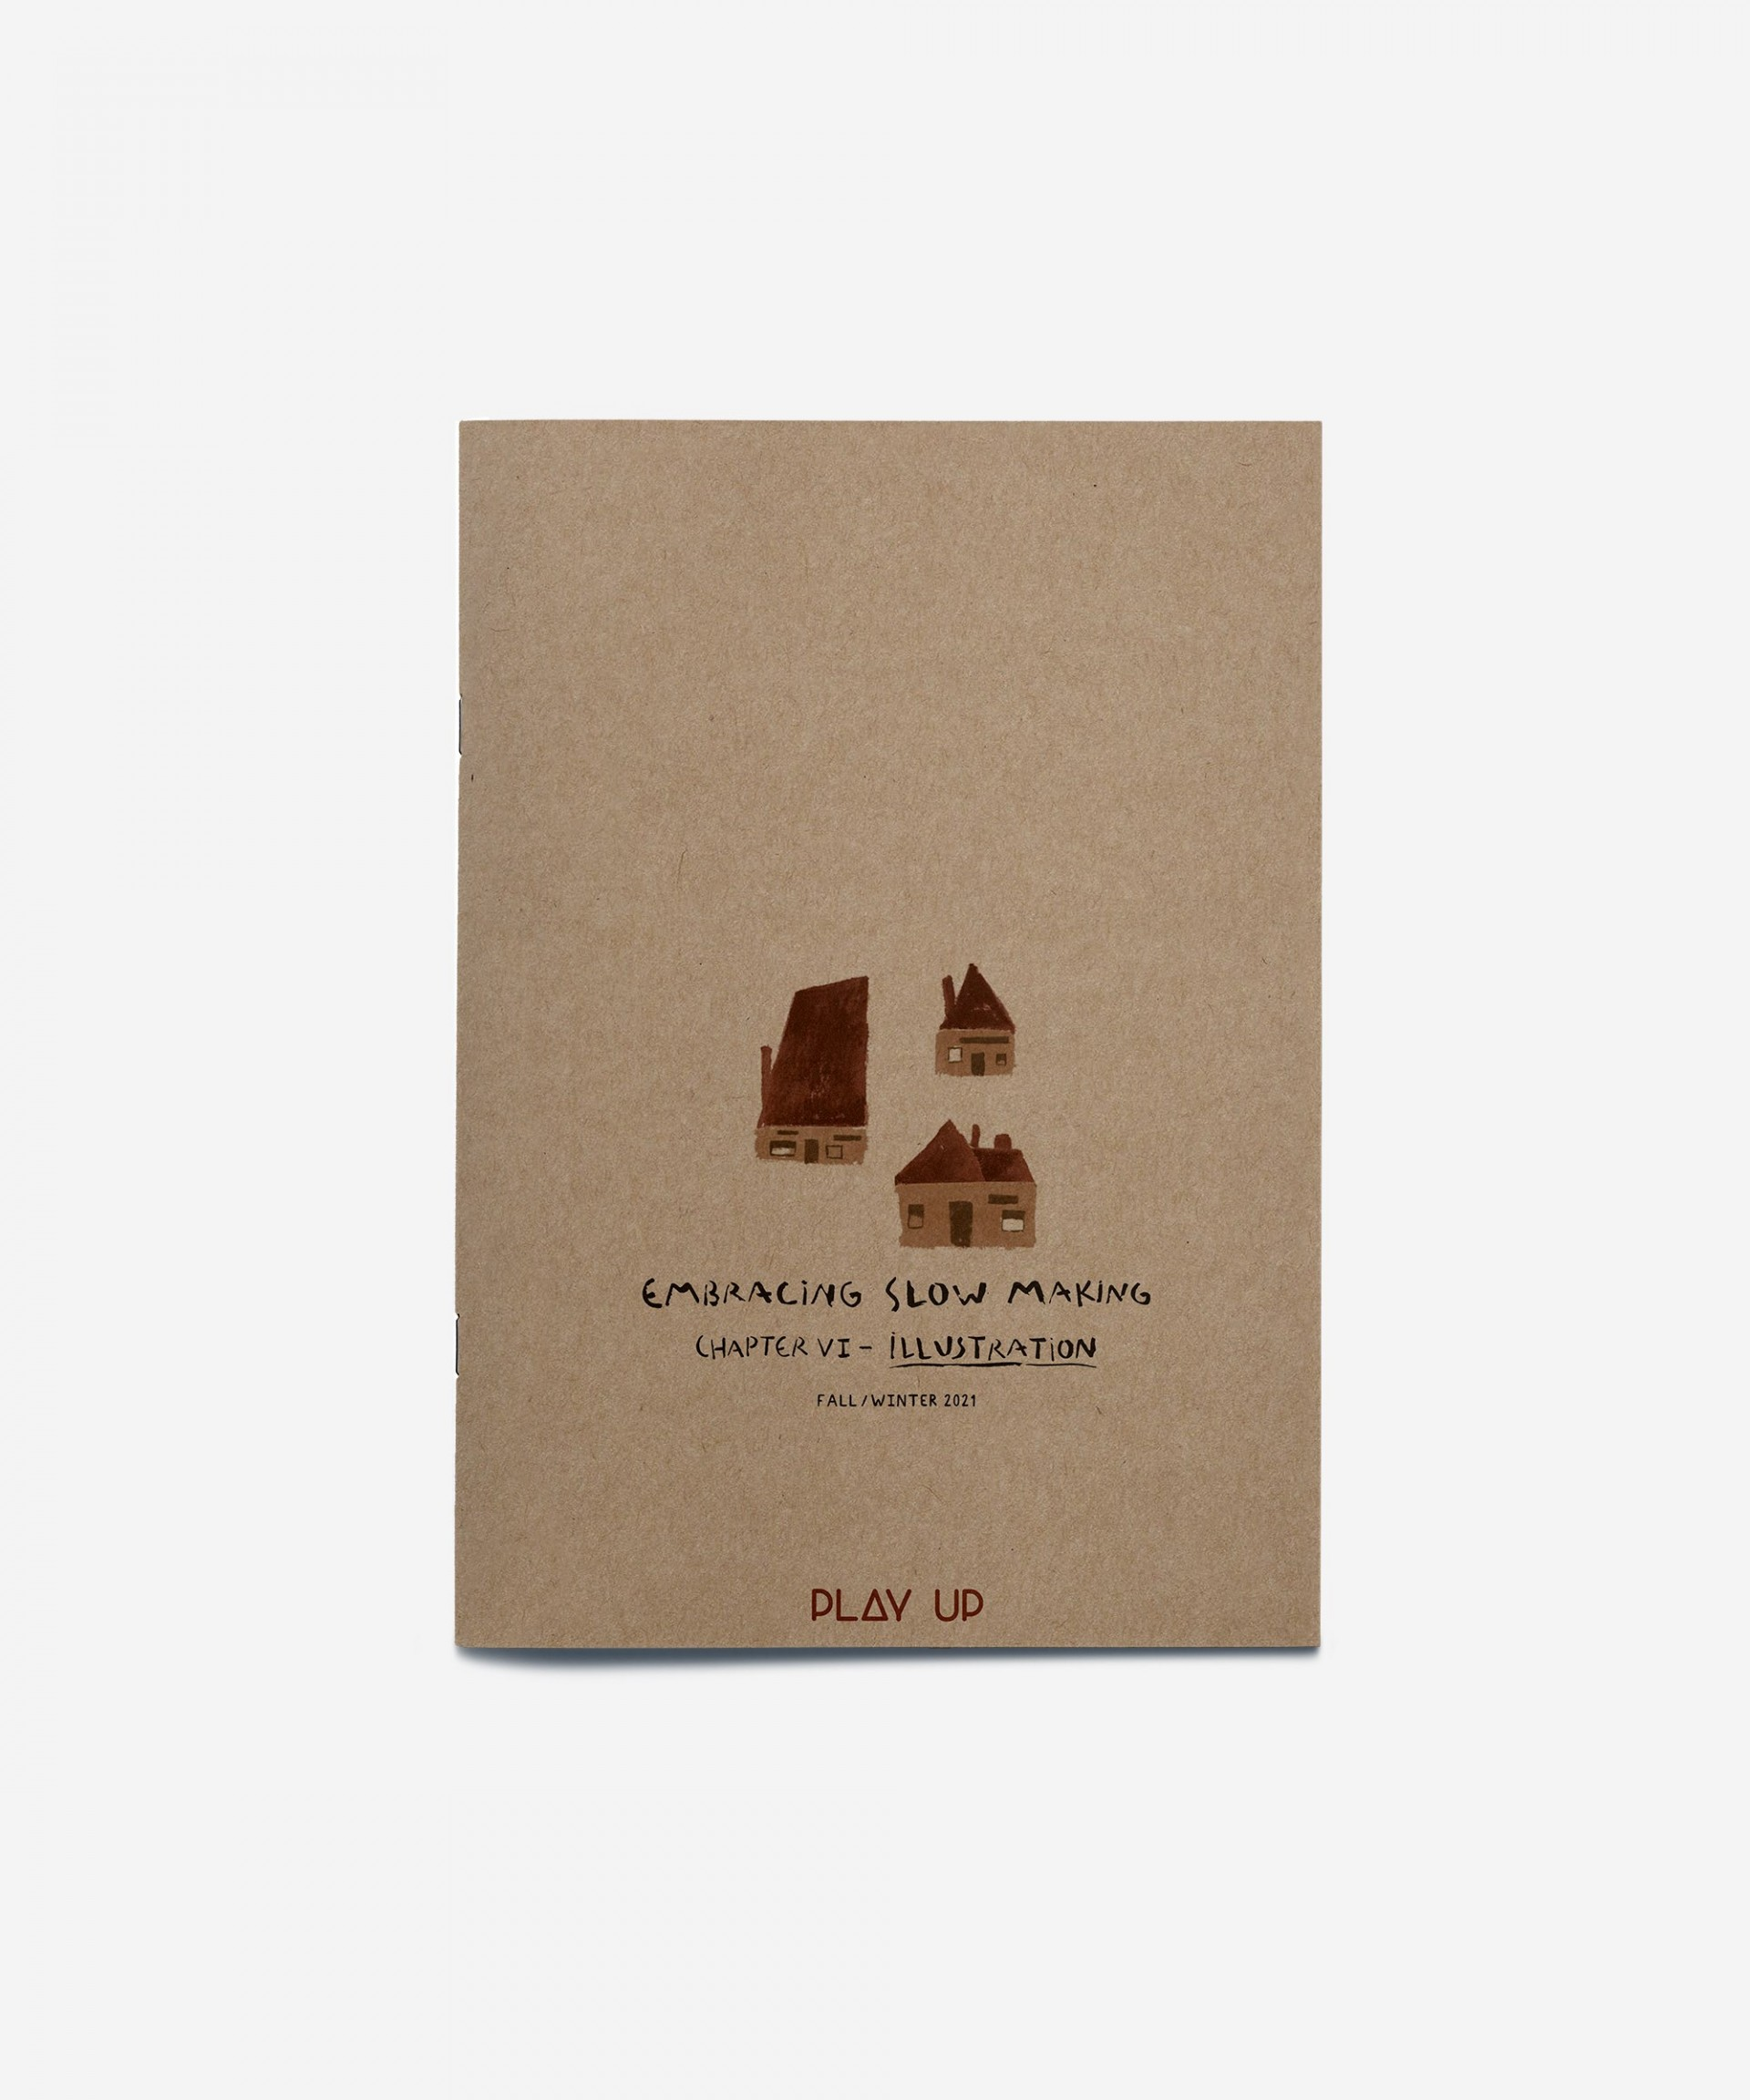 Catálogo Outono-Inverno 2021 | Illustration